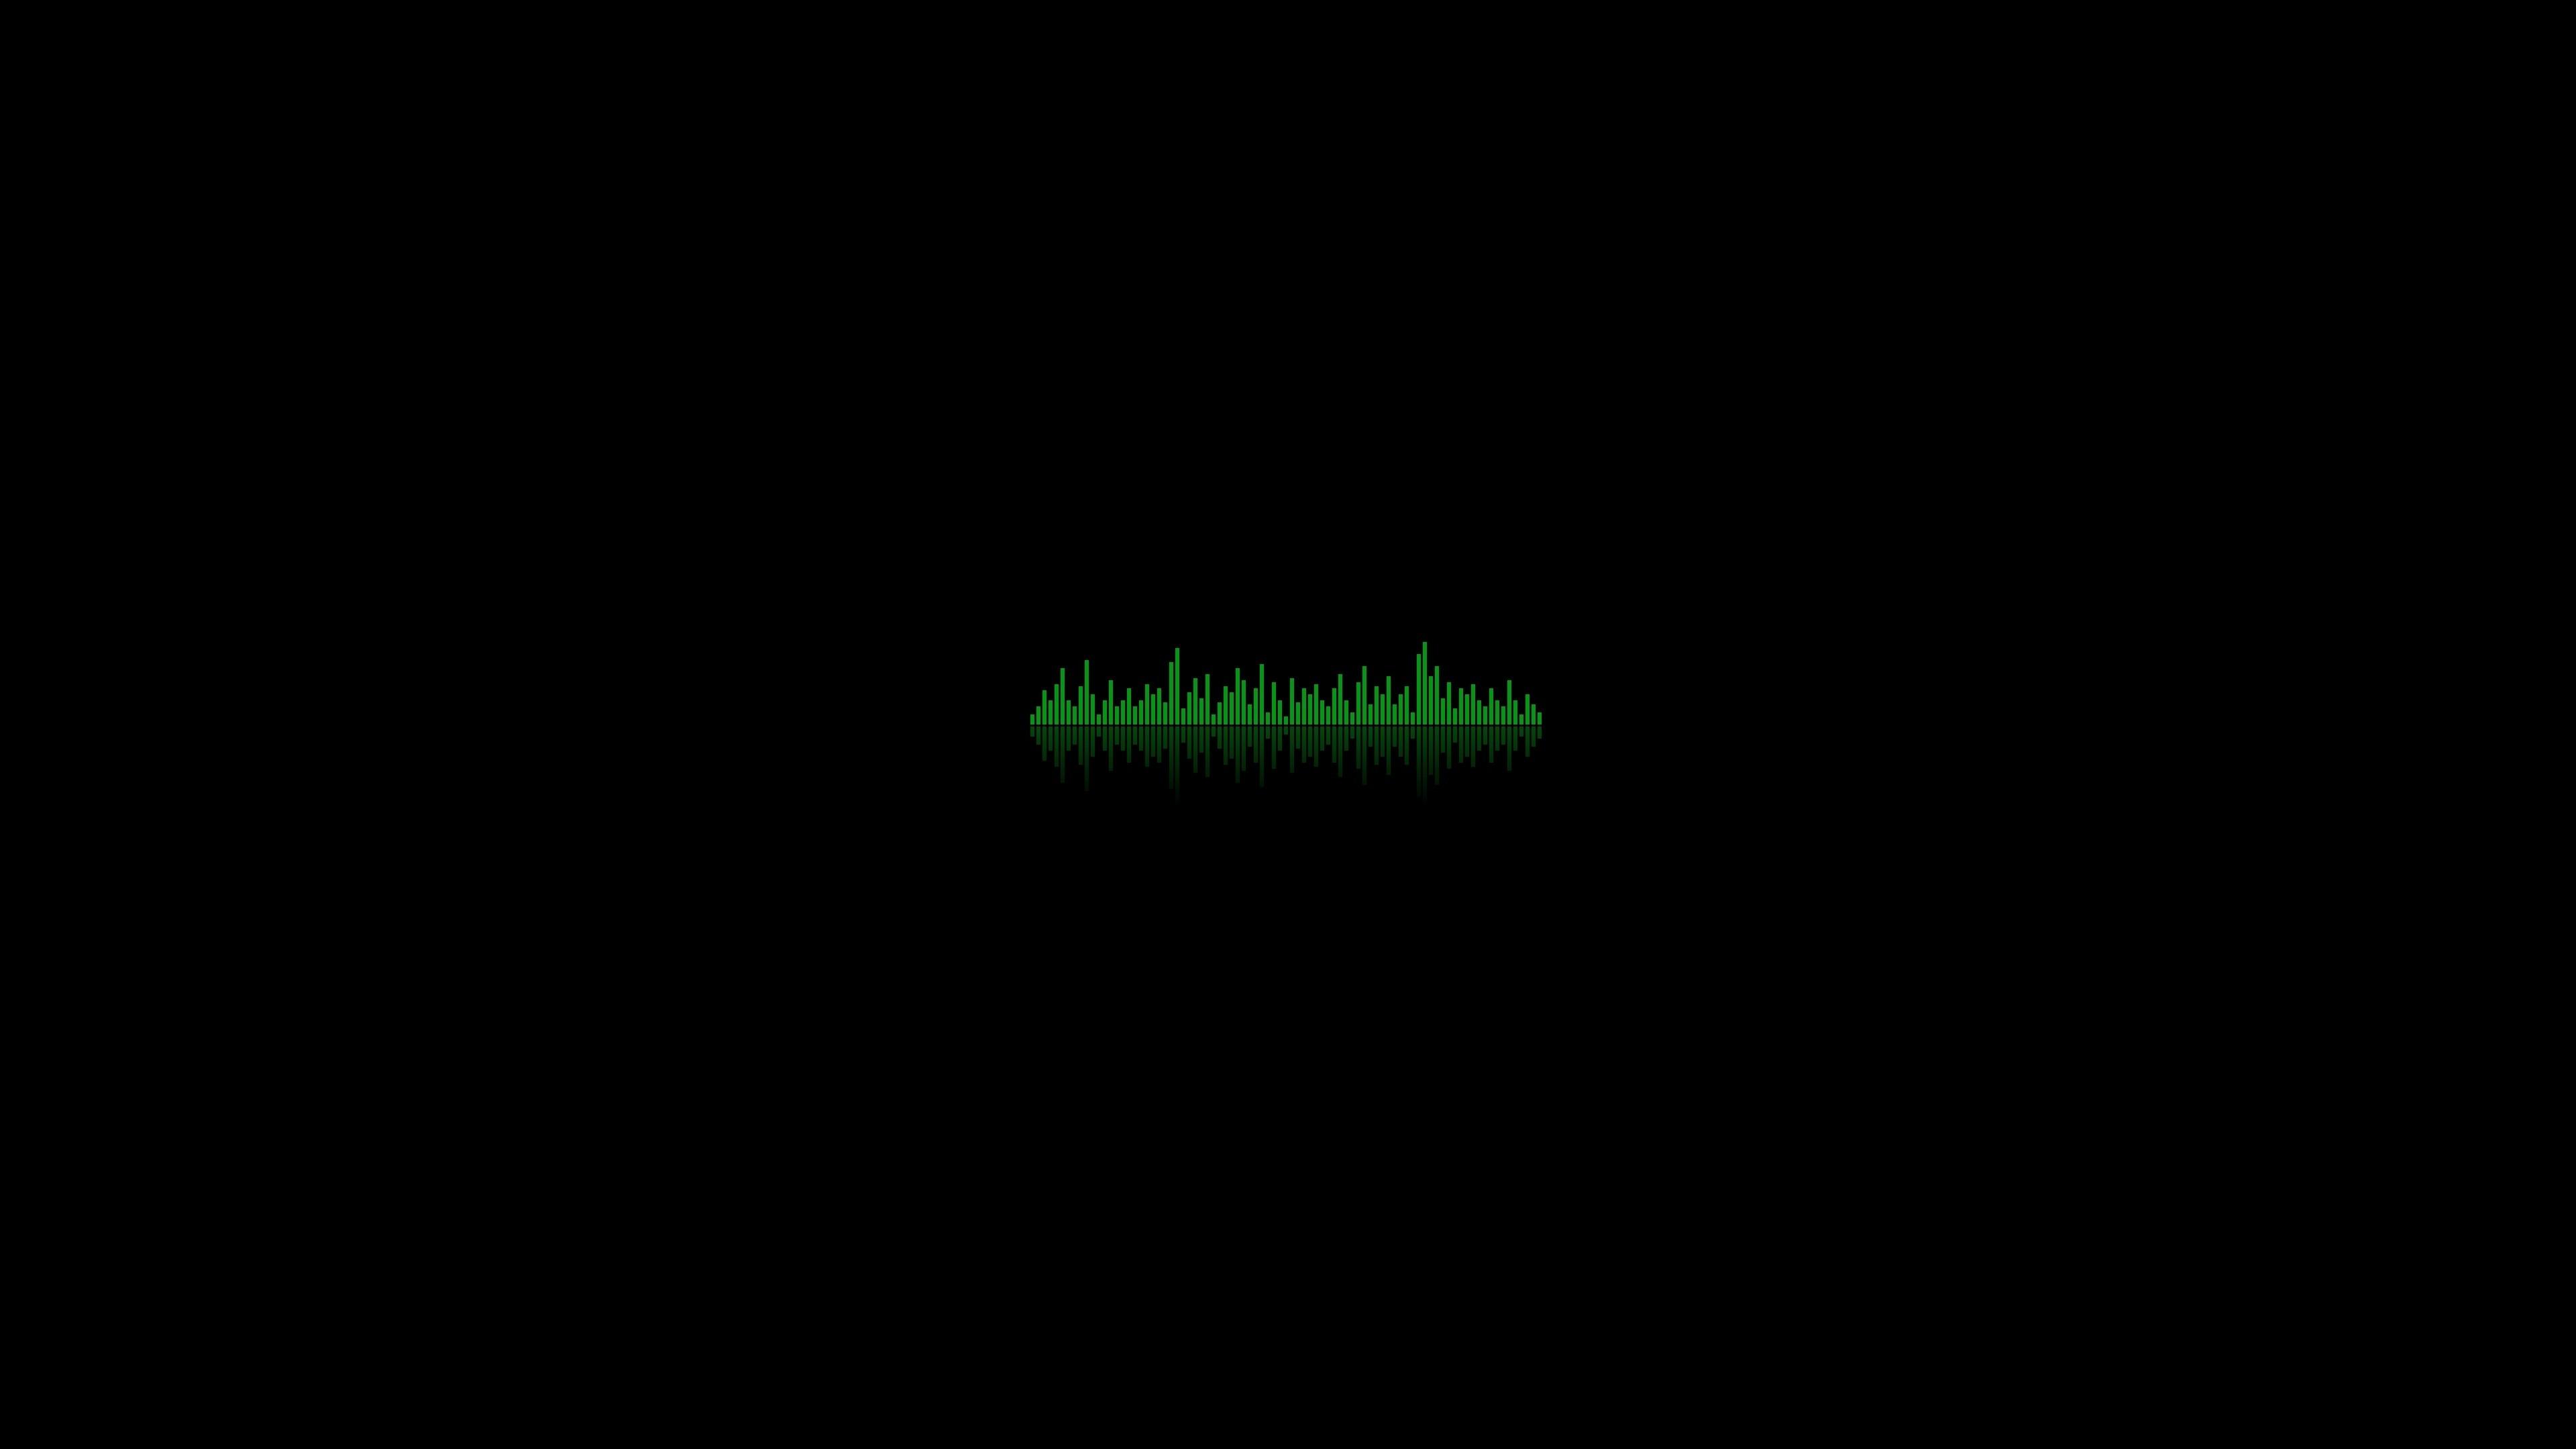 Wallpaper background, equalizer, dark, lines, ribbed, green